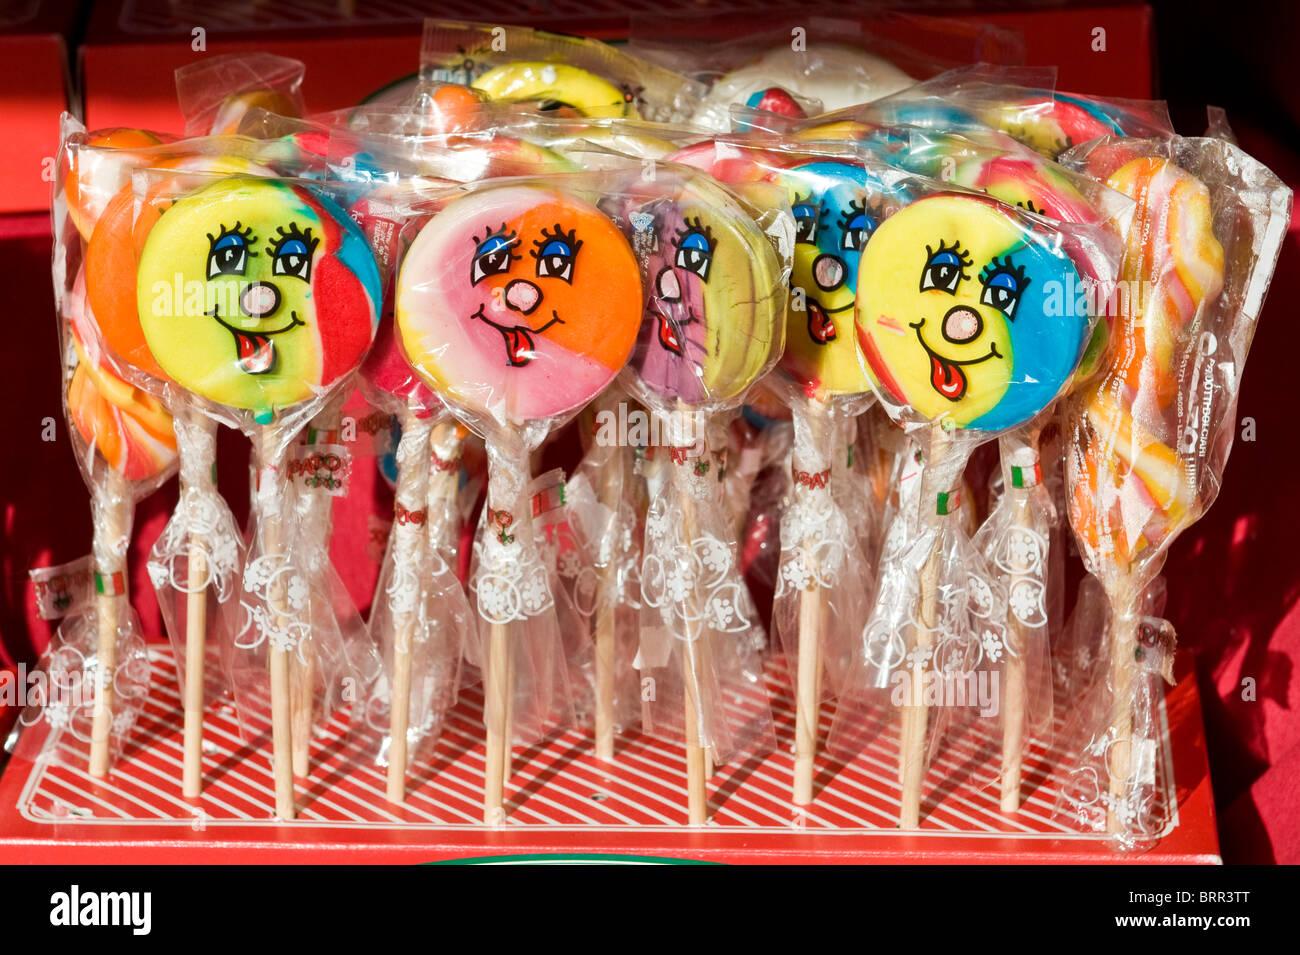 Close-up of multicoloured lollipops in  ellophane wrap - Stock Image